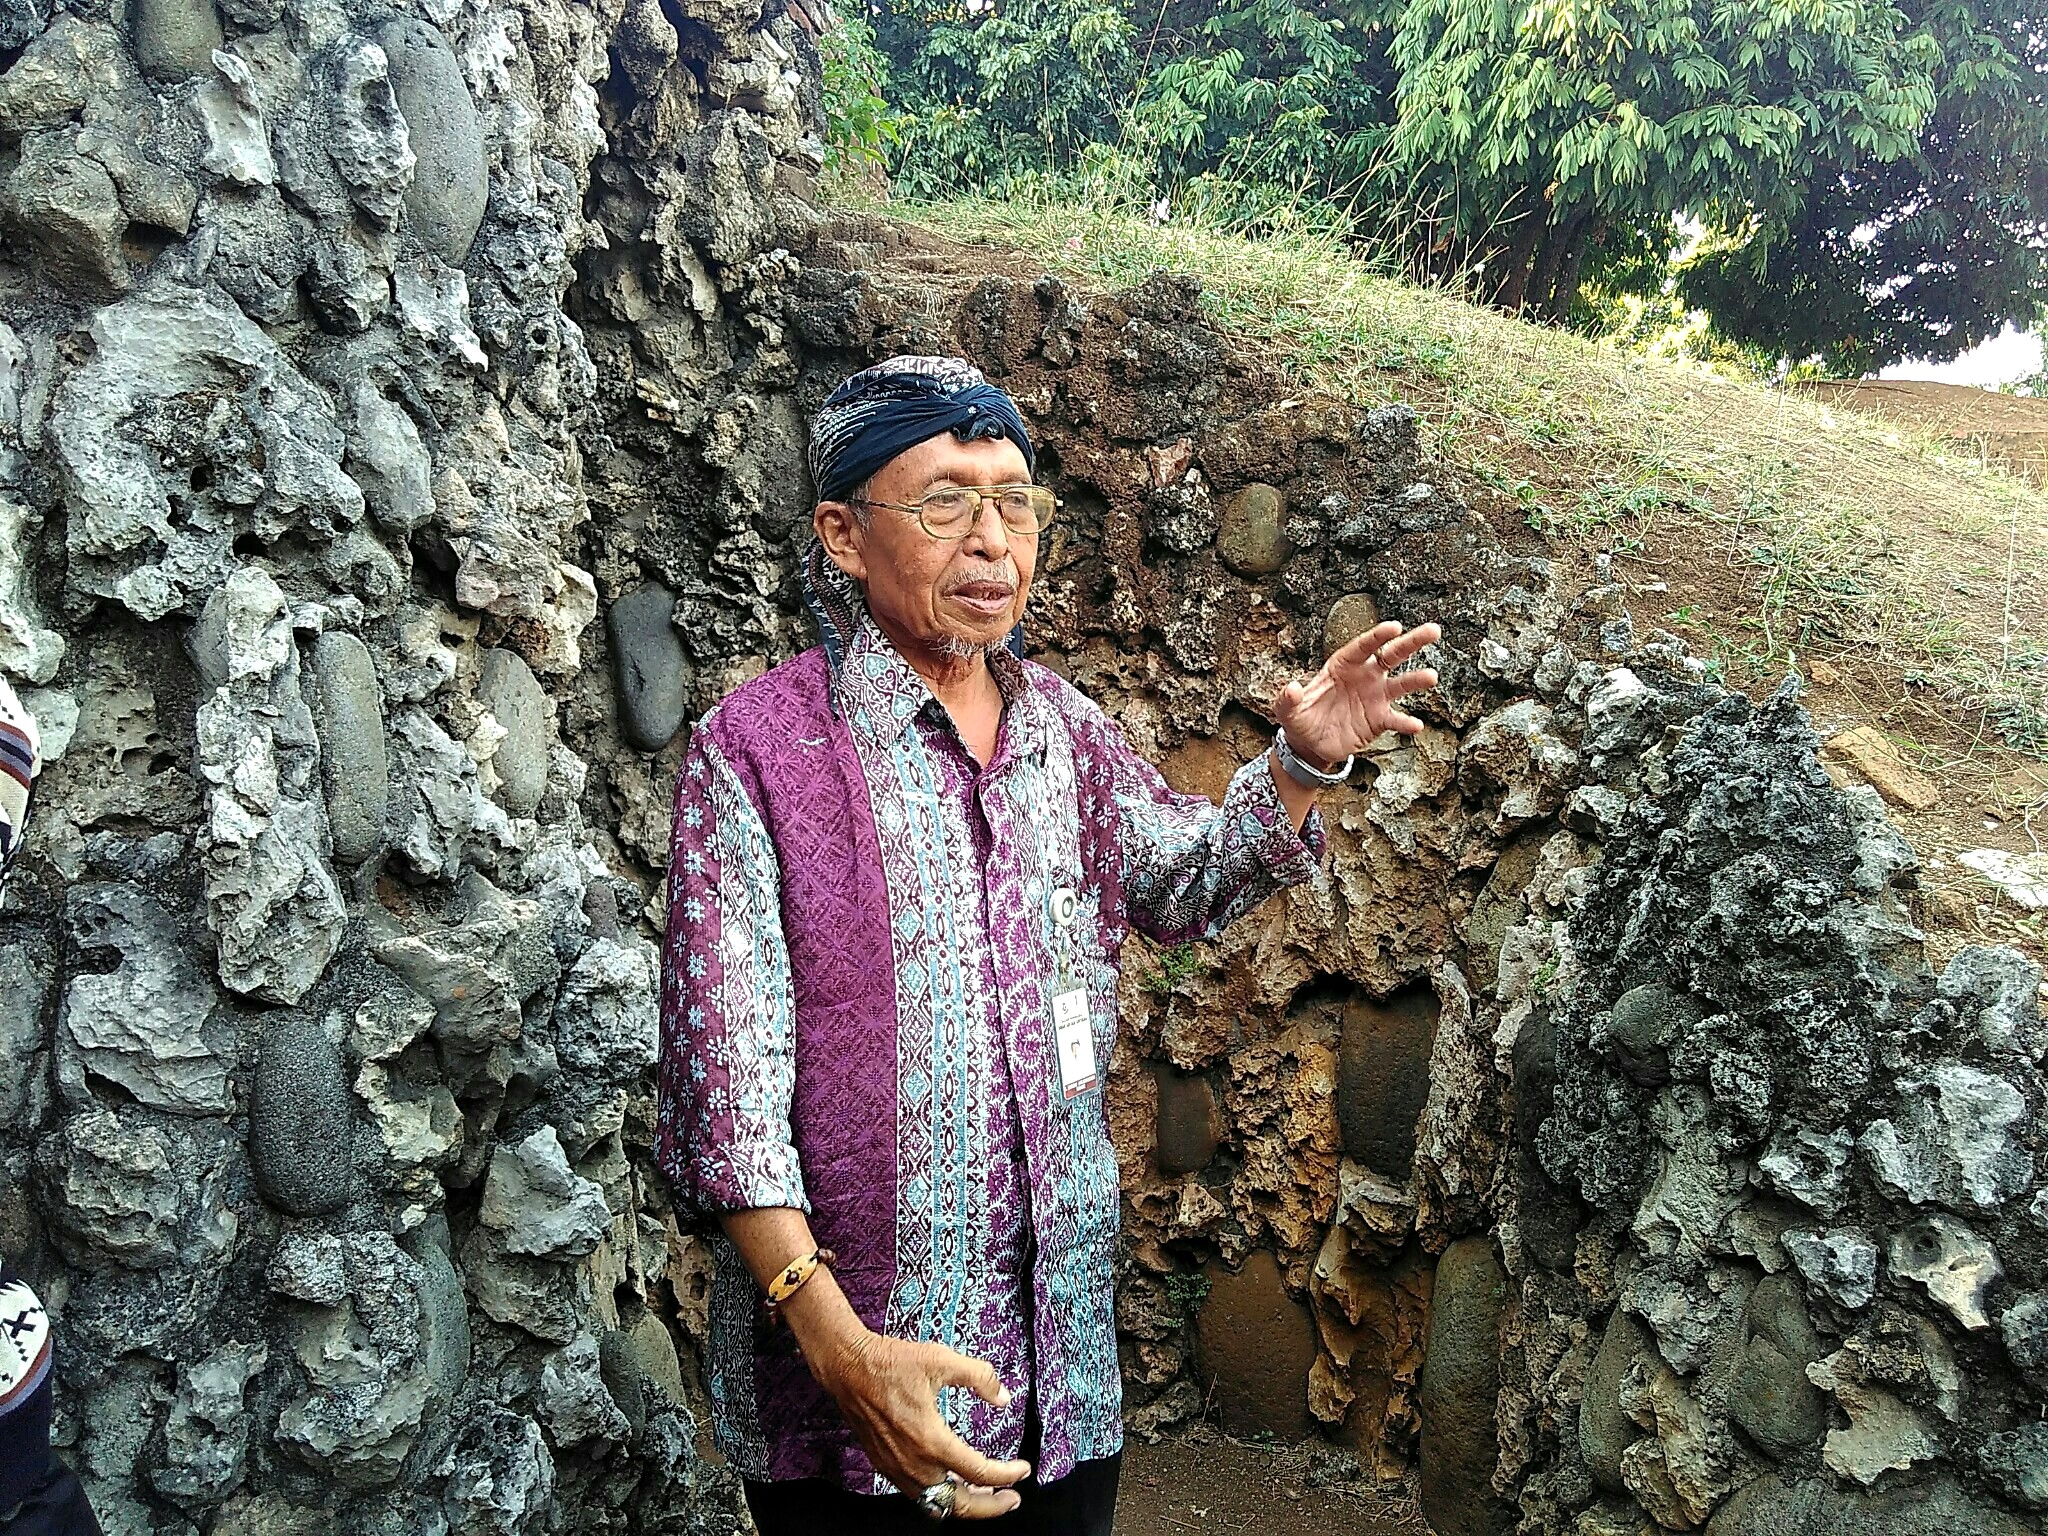 Cerita Mistis Seputar Goa Sunyaragi di Cirebon